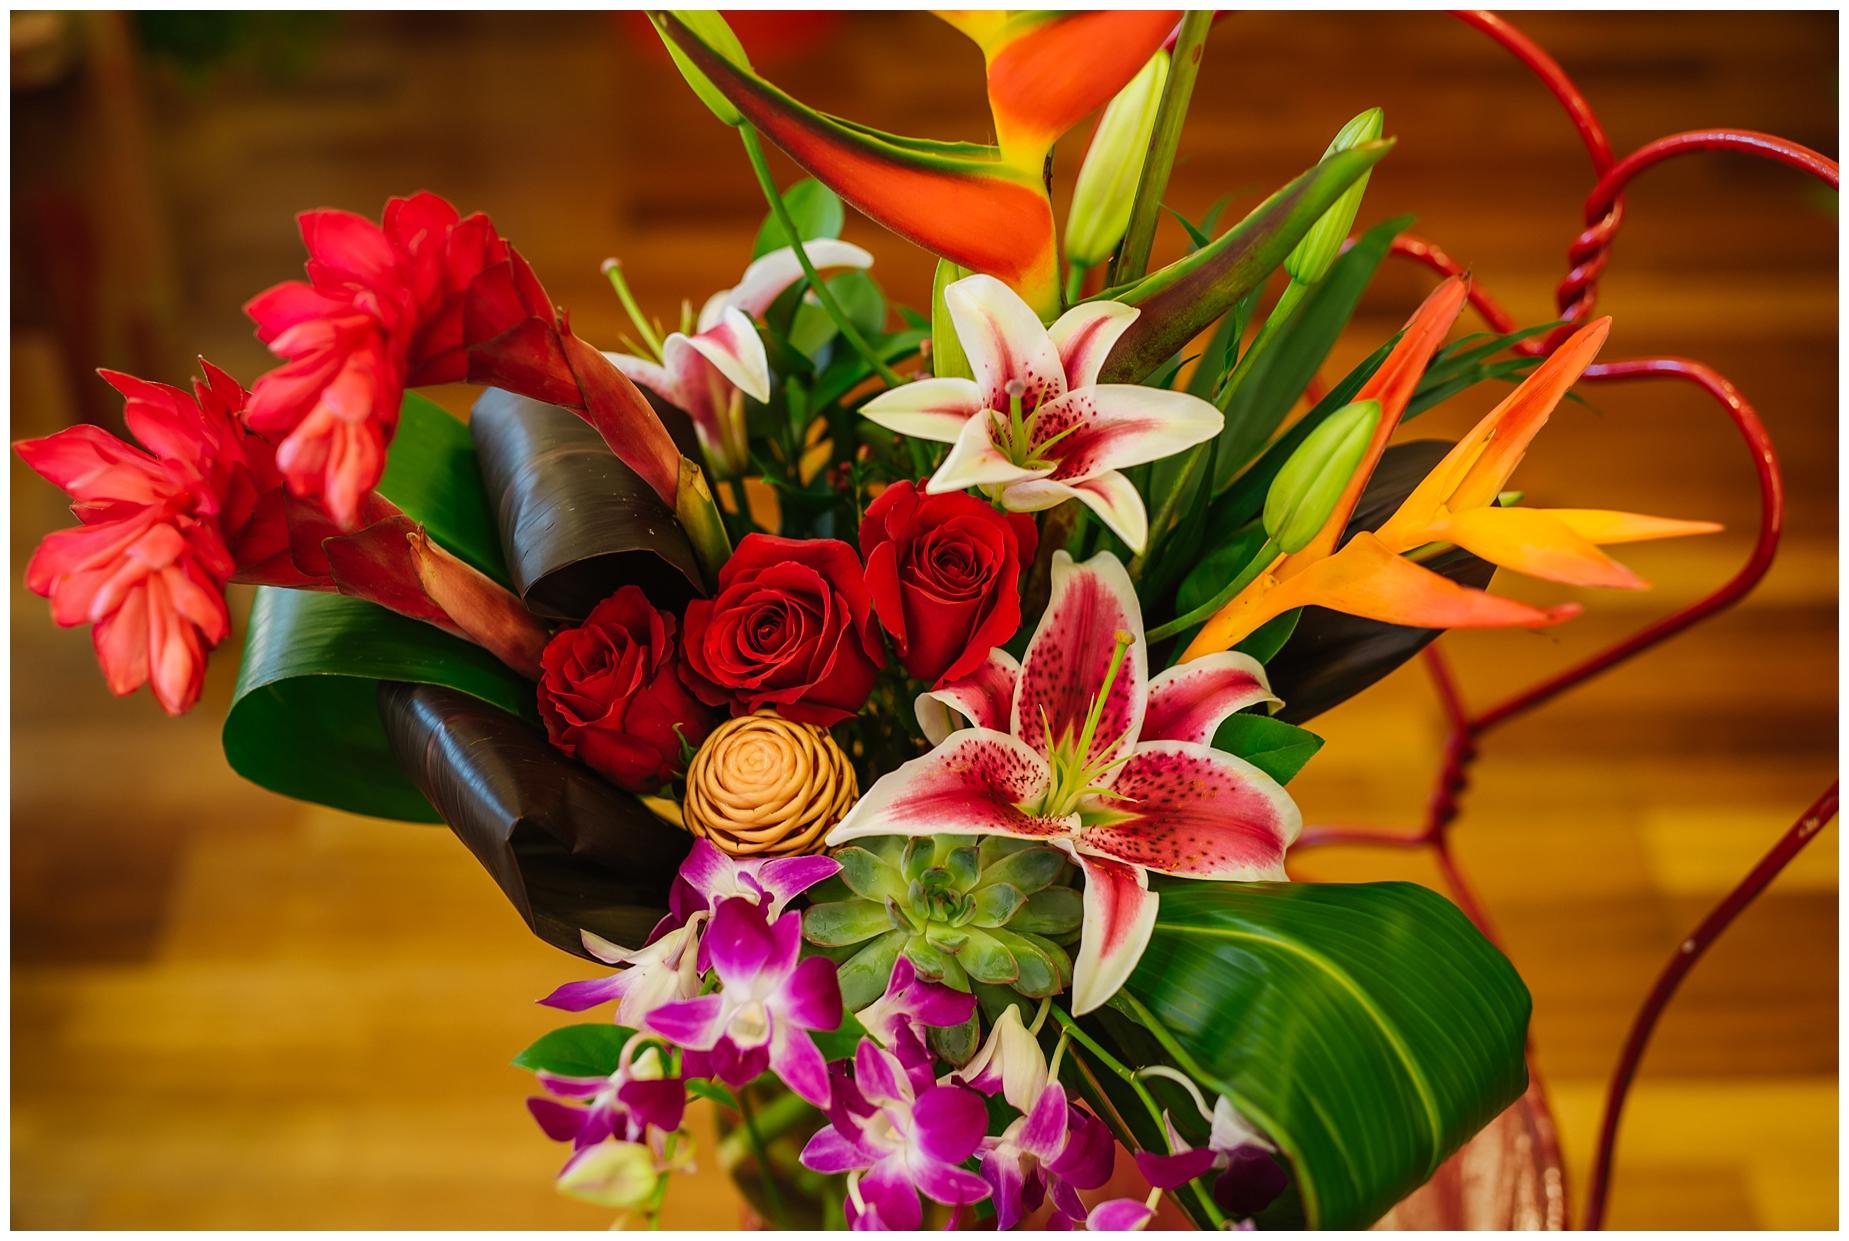 tampa-wedding-photographer-hyde-park-village-florist_0014.jpg